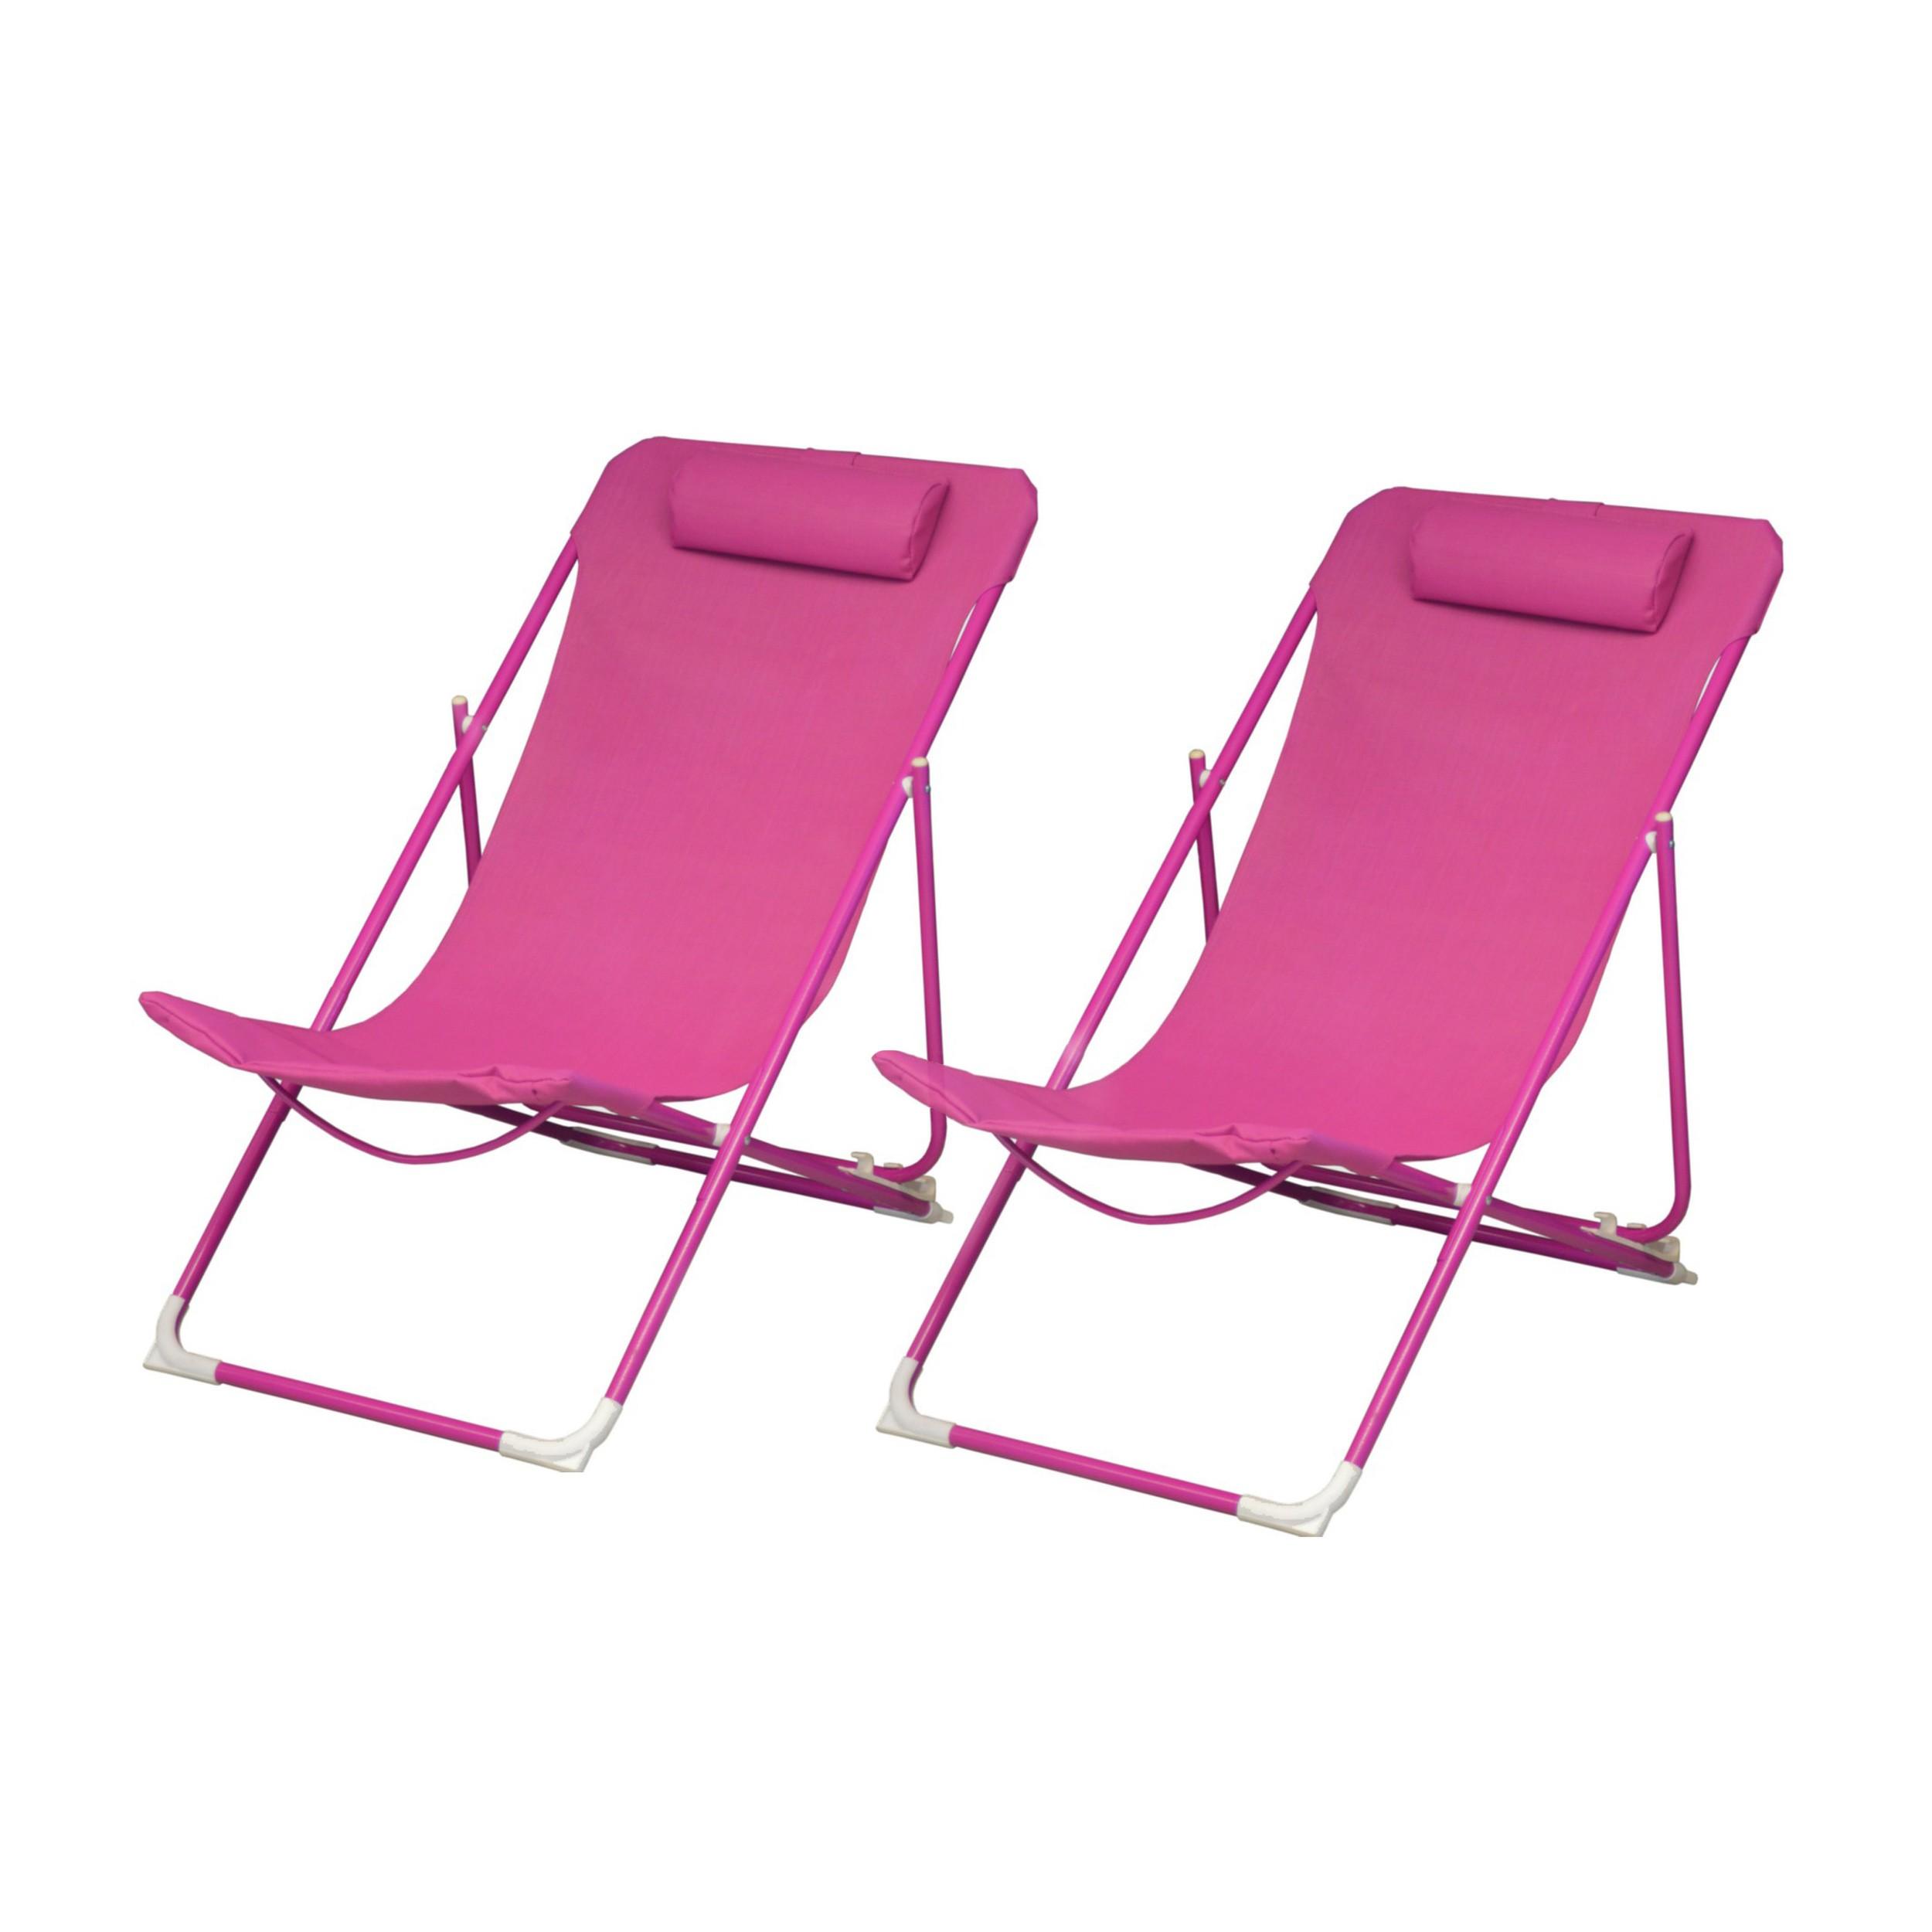 La Chaise Longue Billard chaise longue almeria rose (lot de 2)